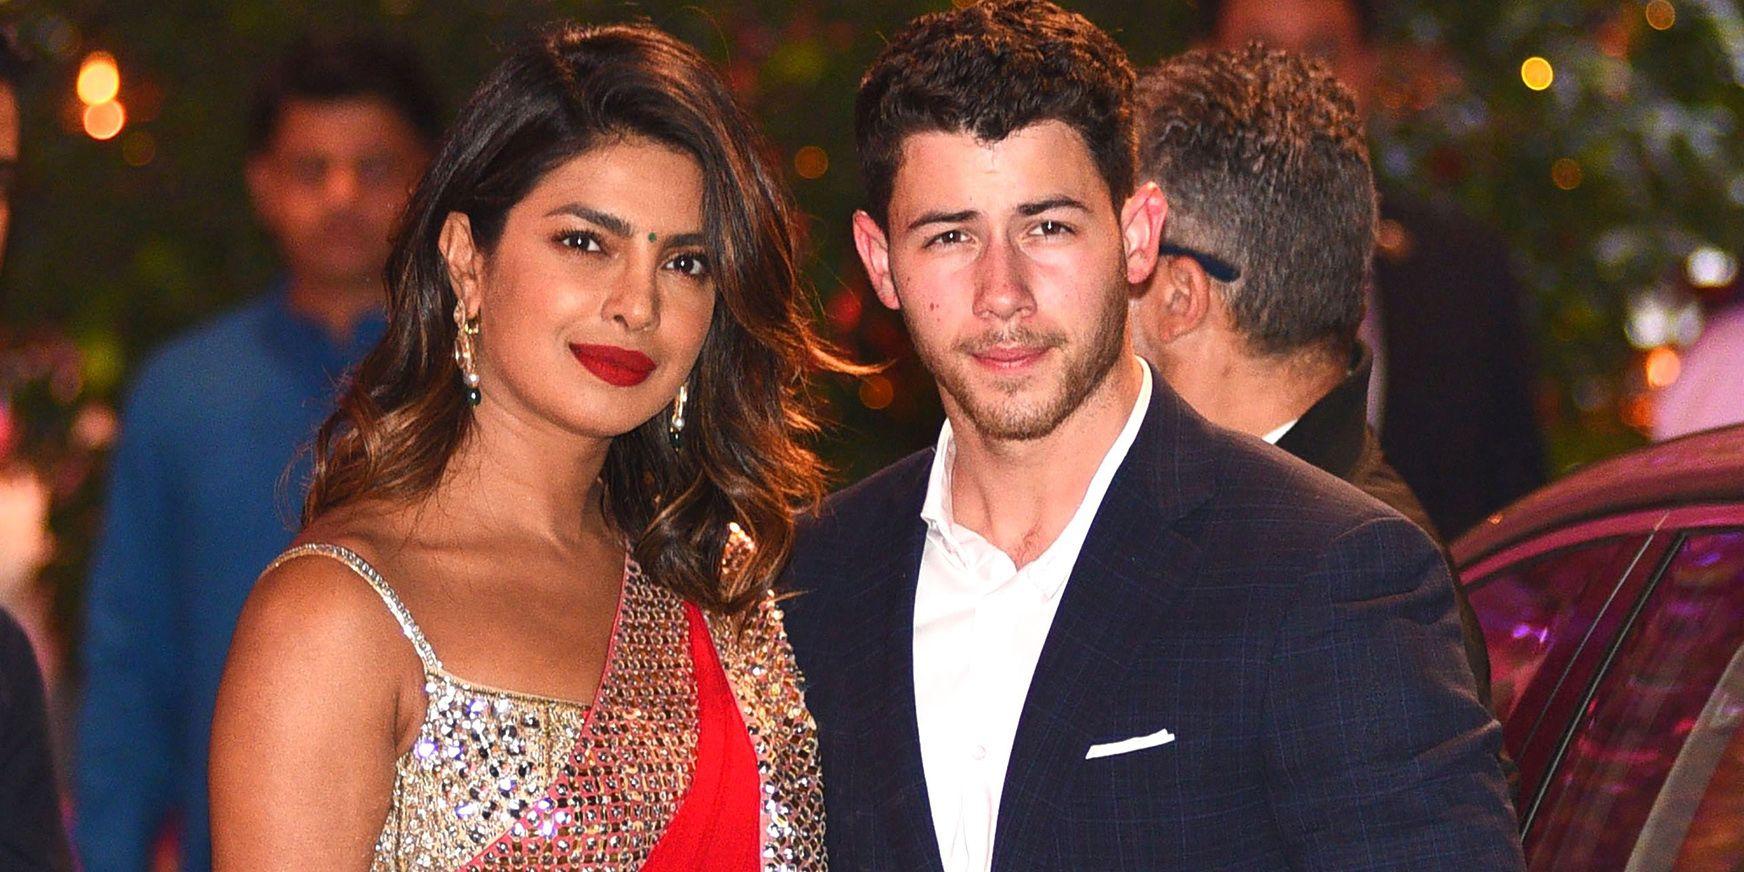 Priyanka chopra dating anyone